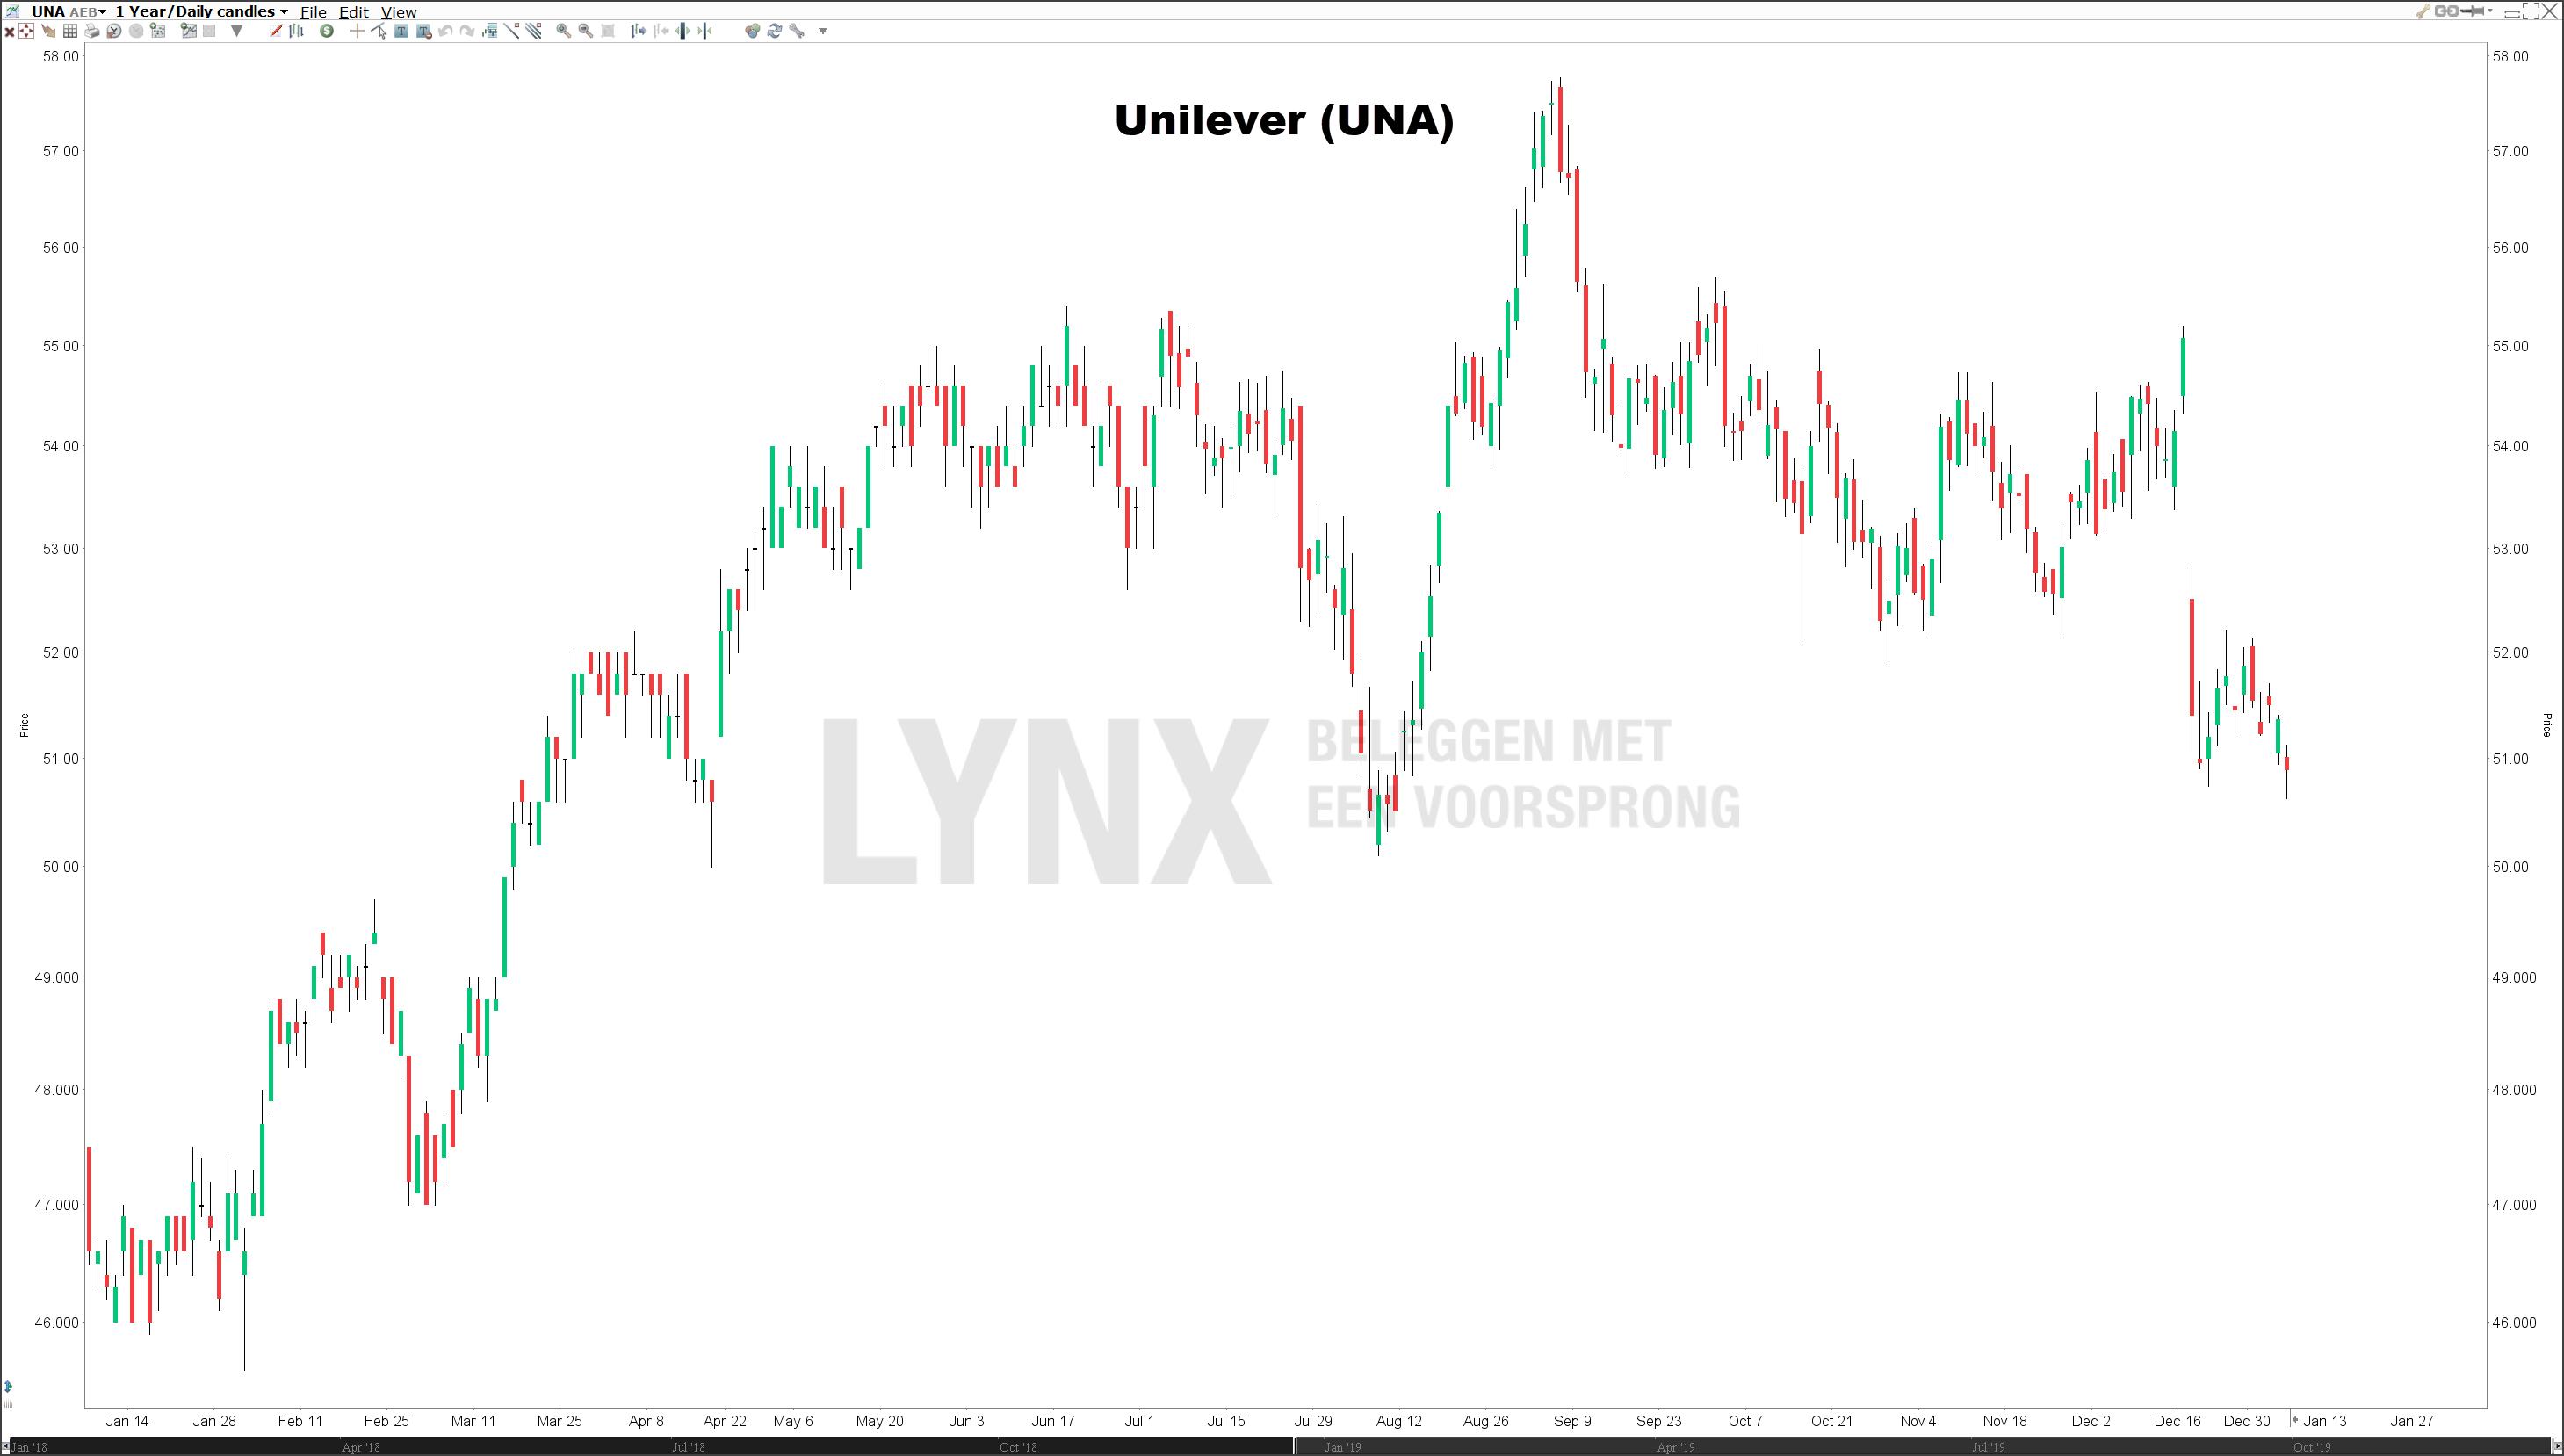 Koers Unilever Nederlandse dividendaandelen